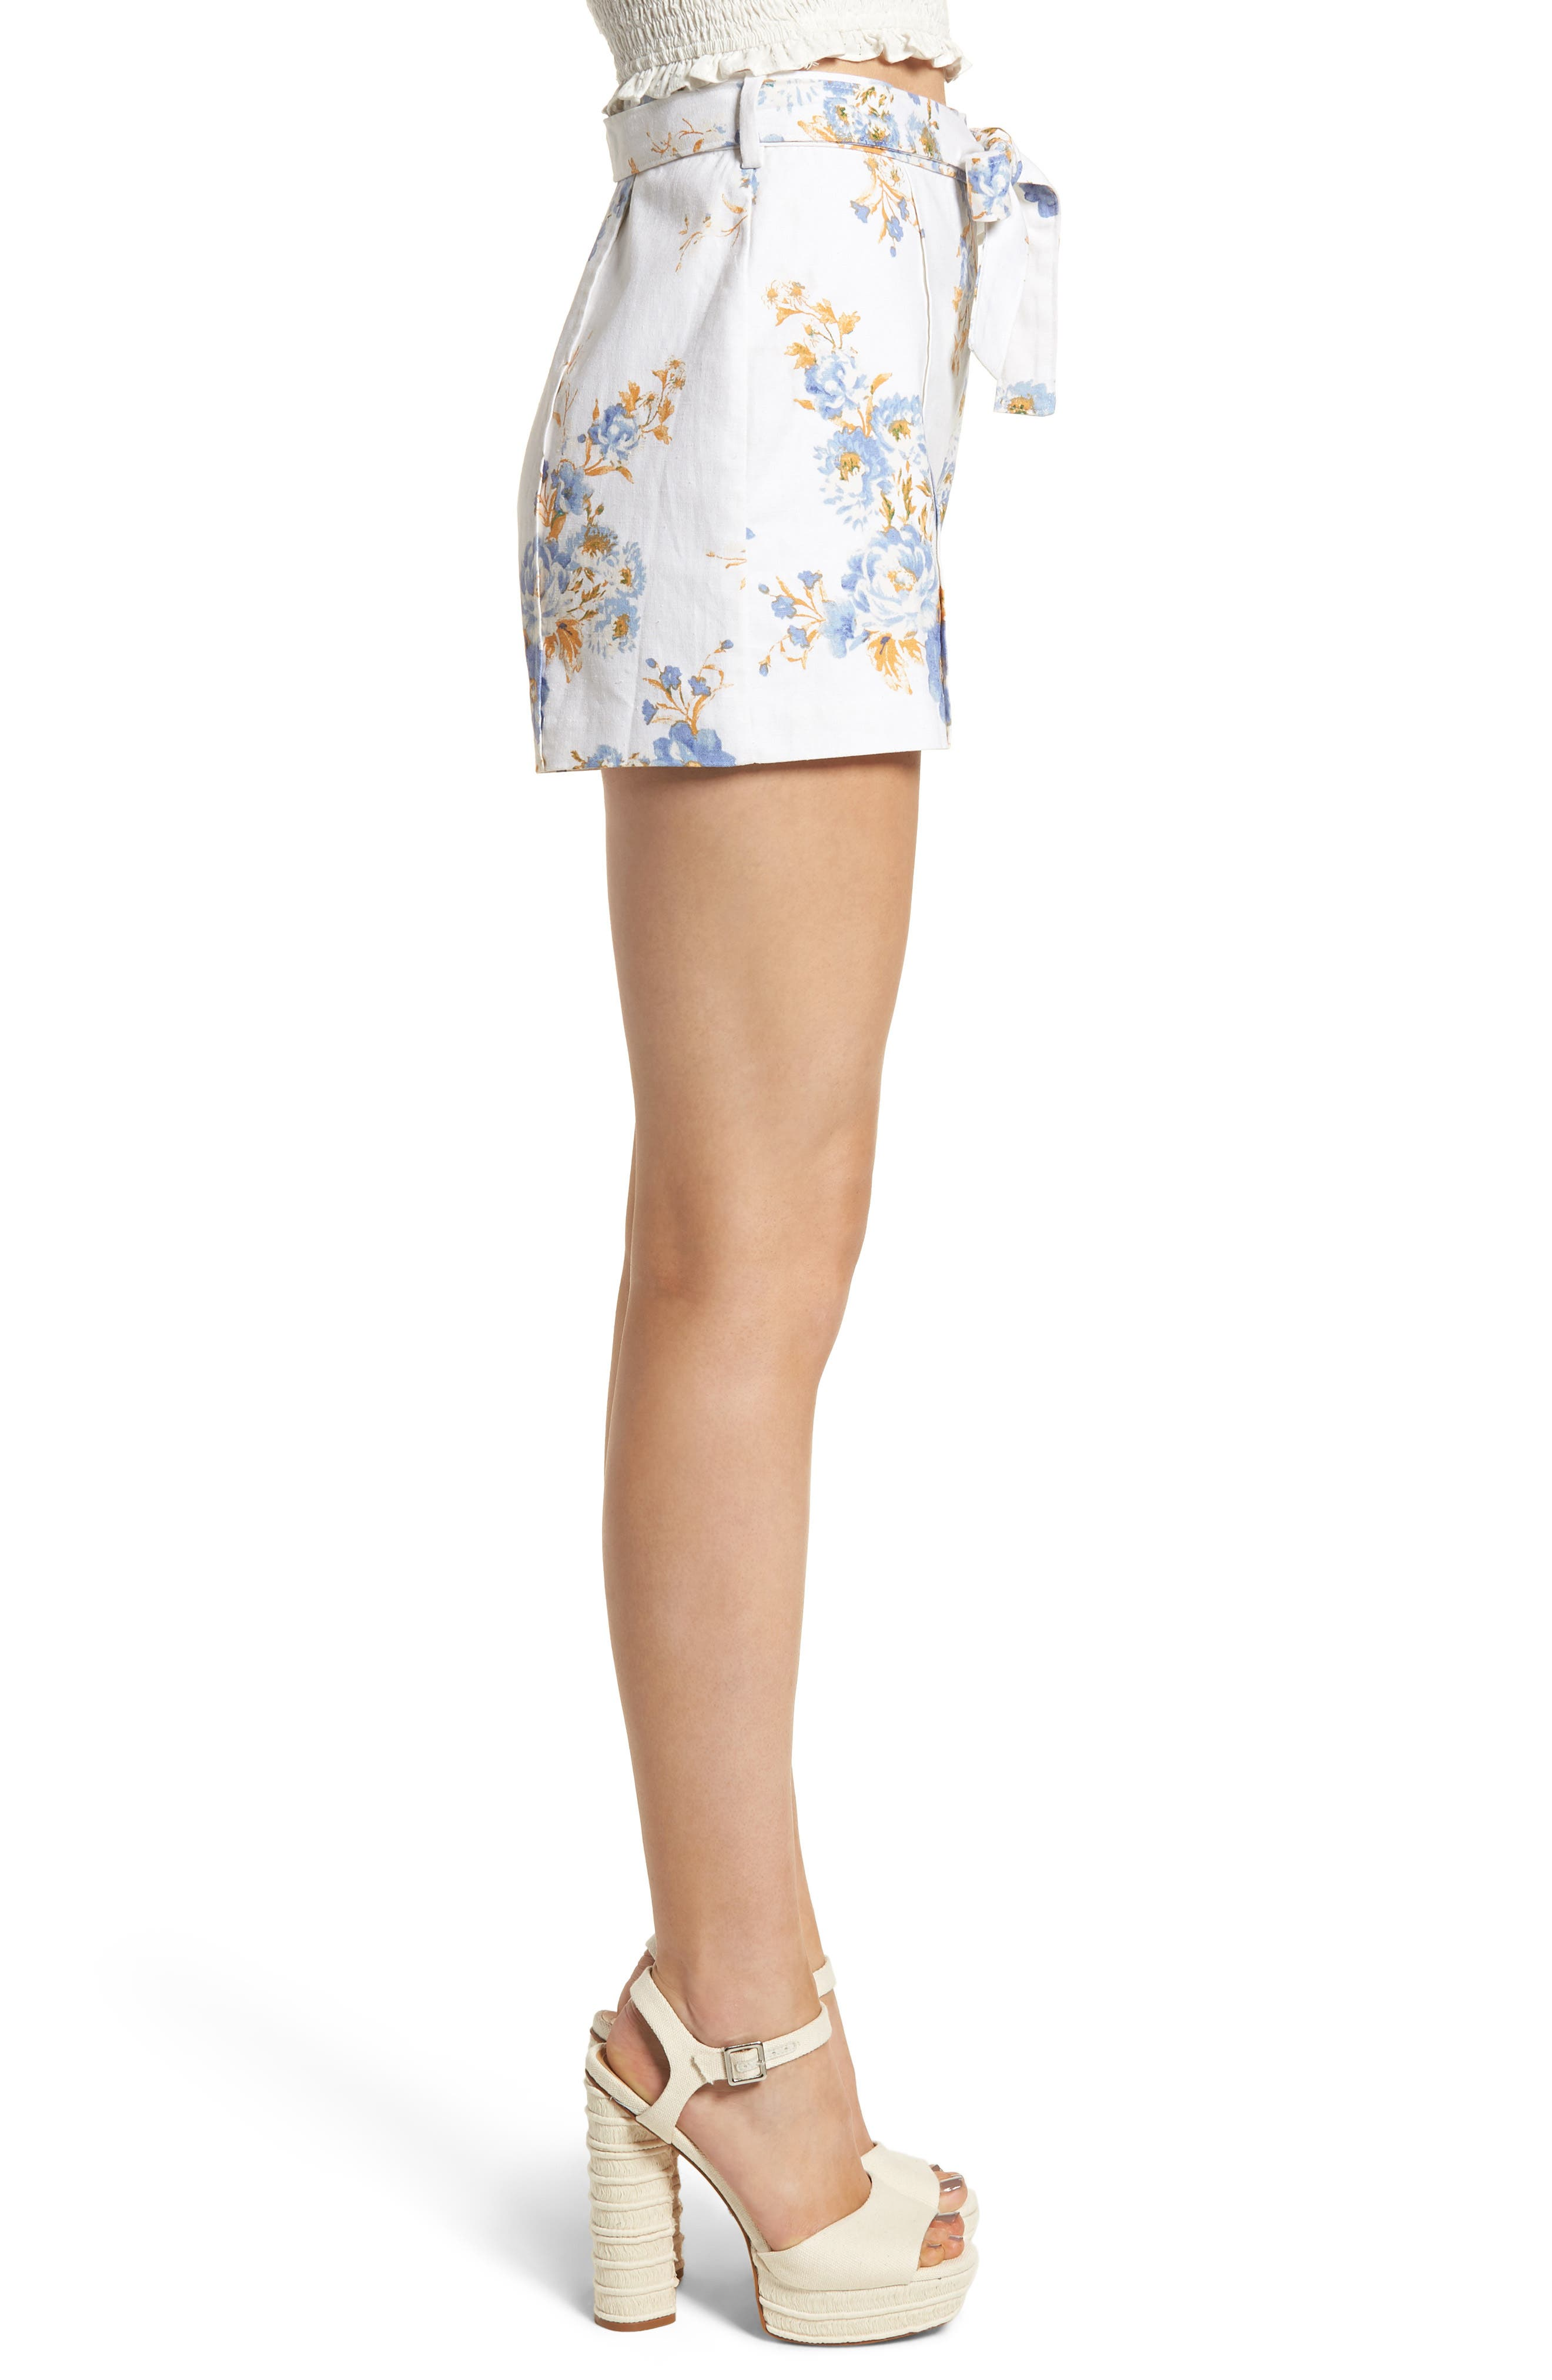 Matera High Waist Shorts,                             Alternate thumbnail 3, color,                             Ivory Floral